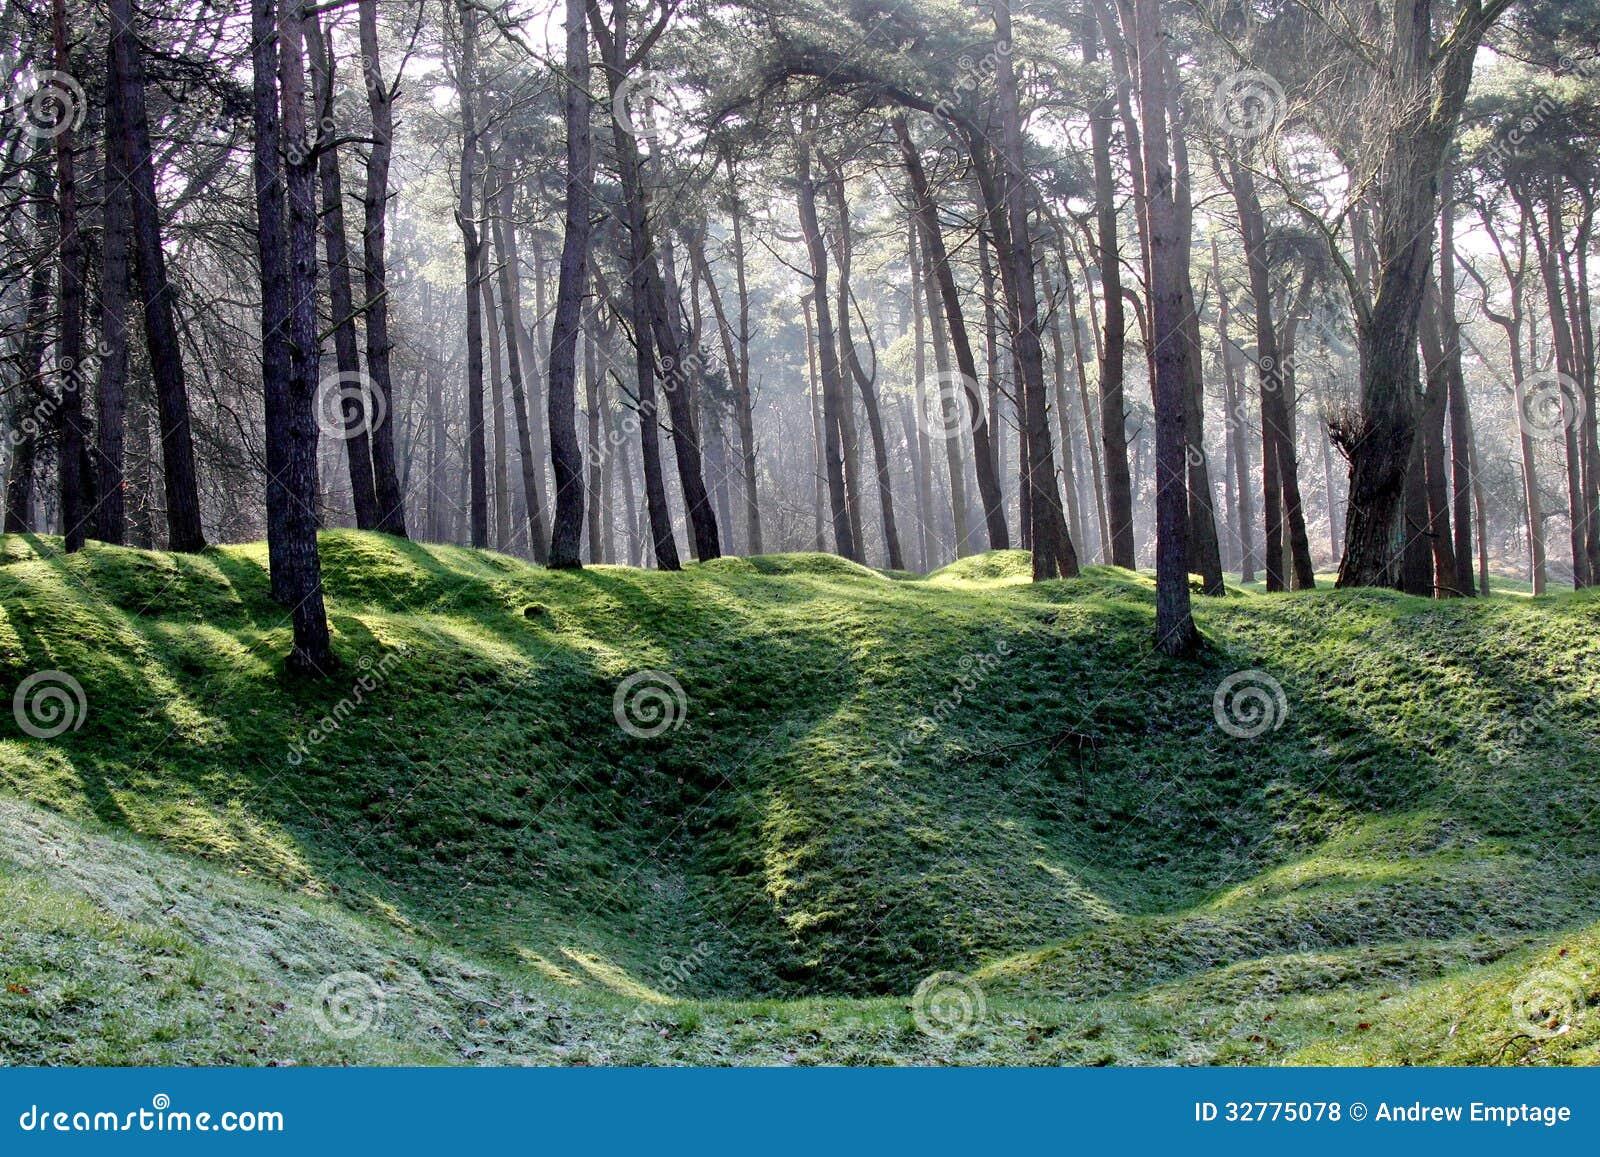 ww1 landscape memorial forest - photo #14